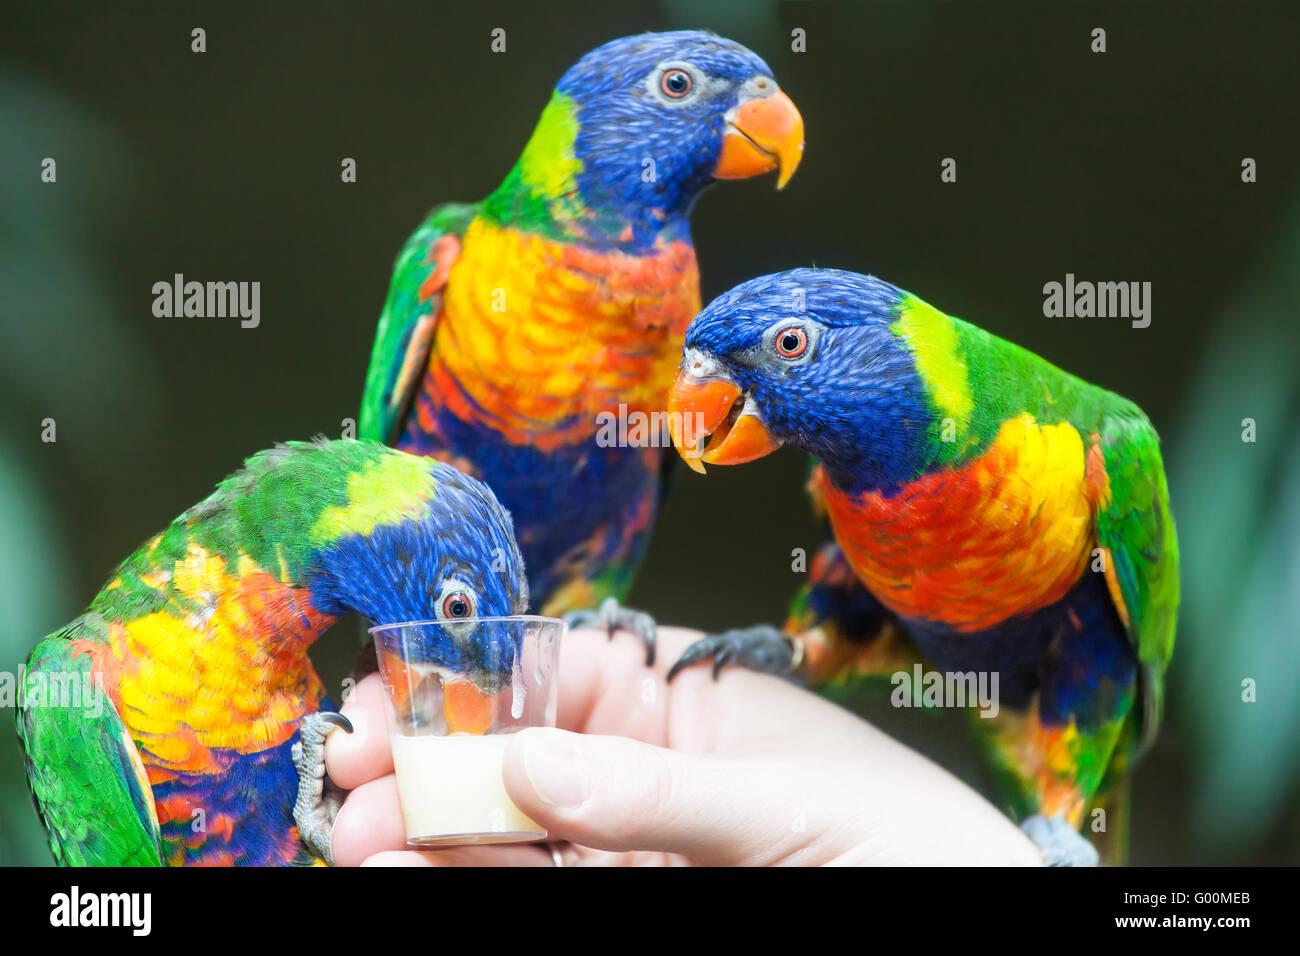 Rainbow Lorikeet Parrot Foto de stock